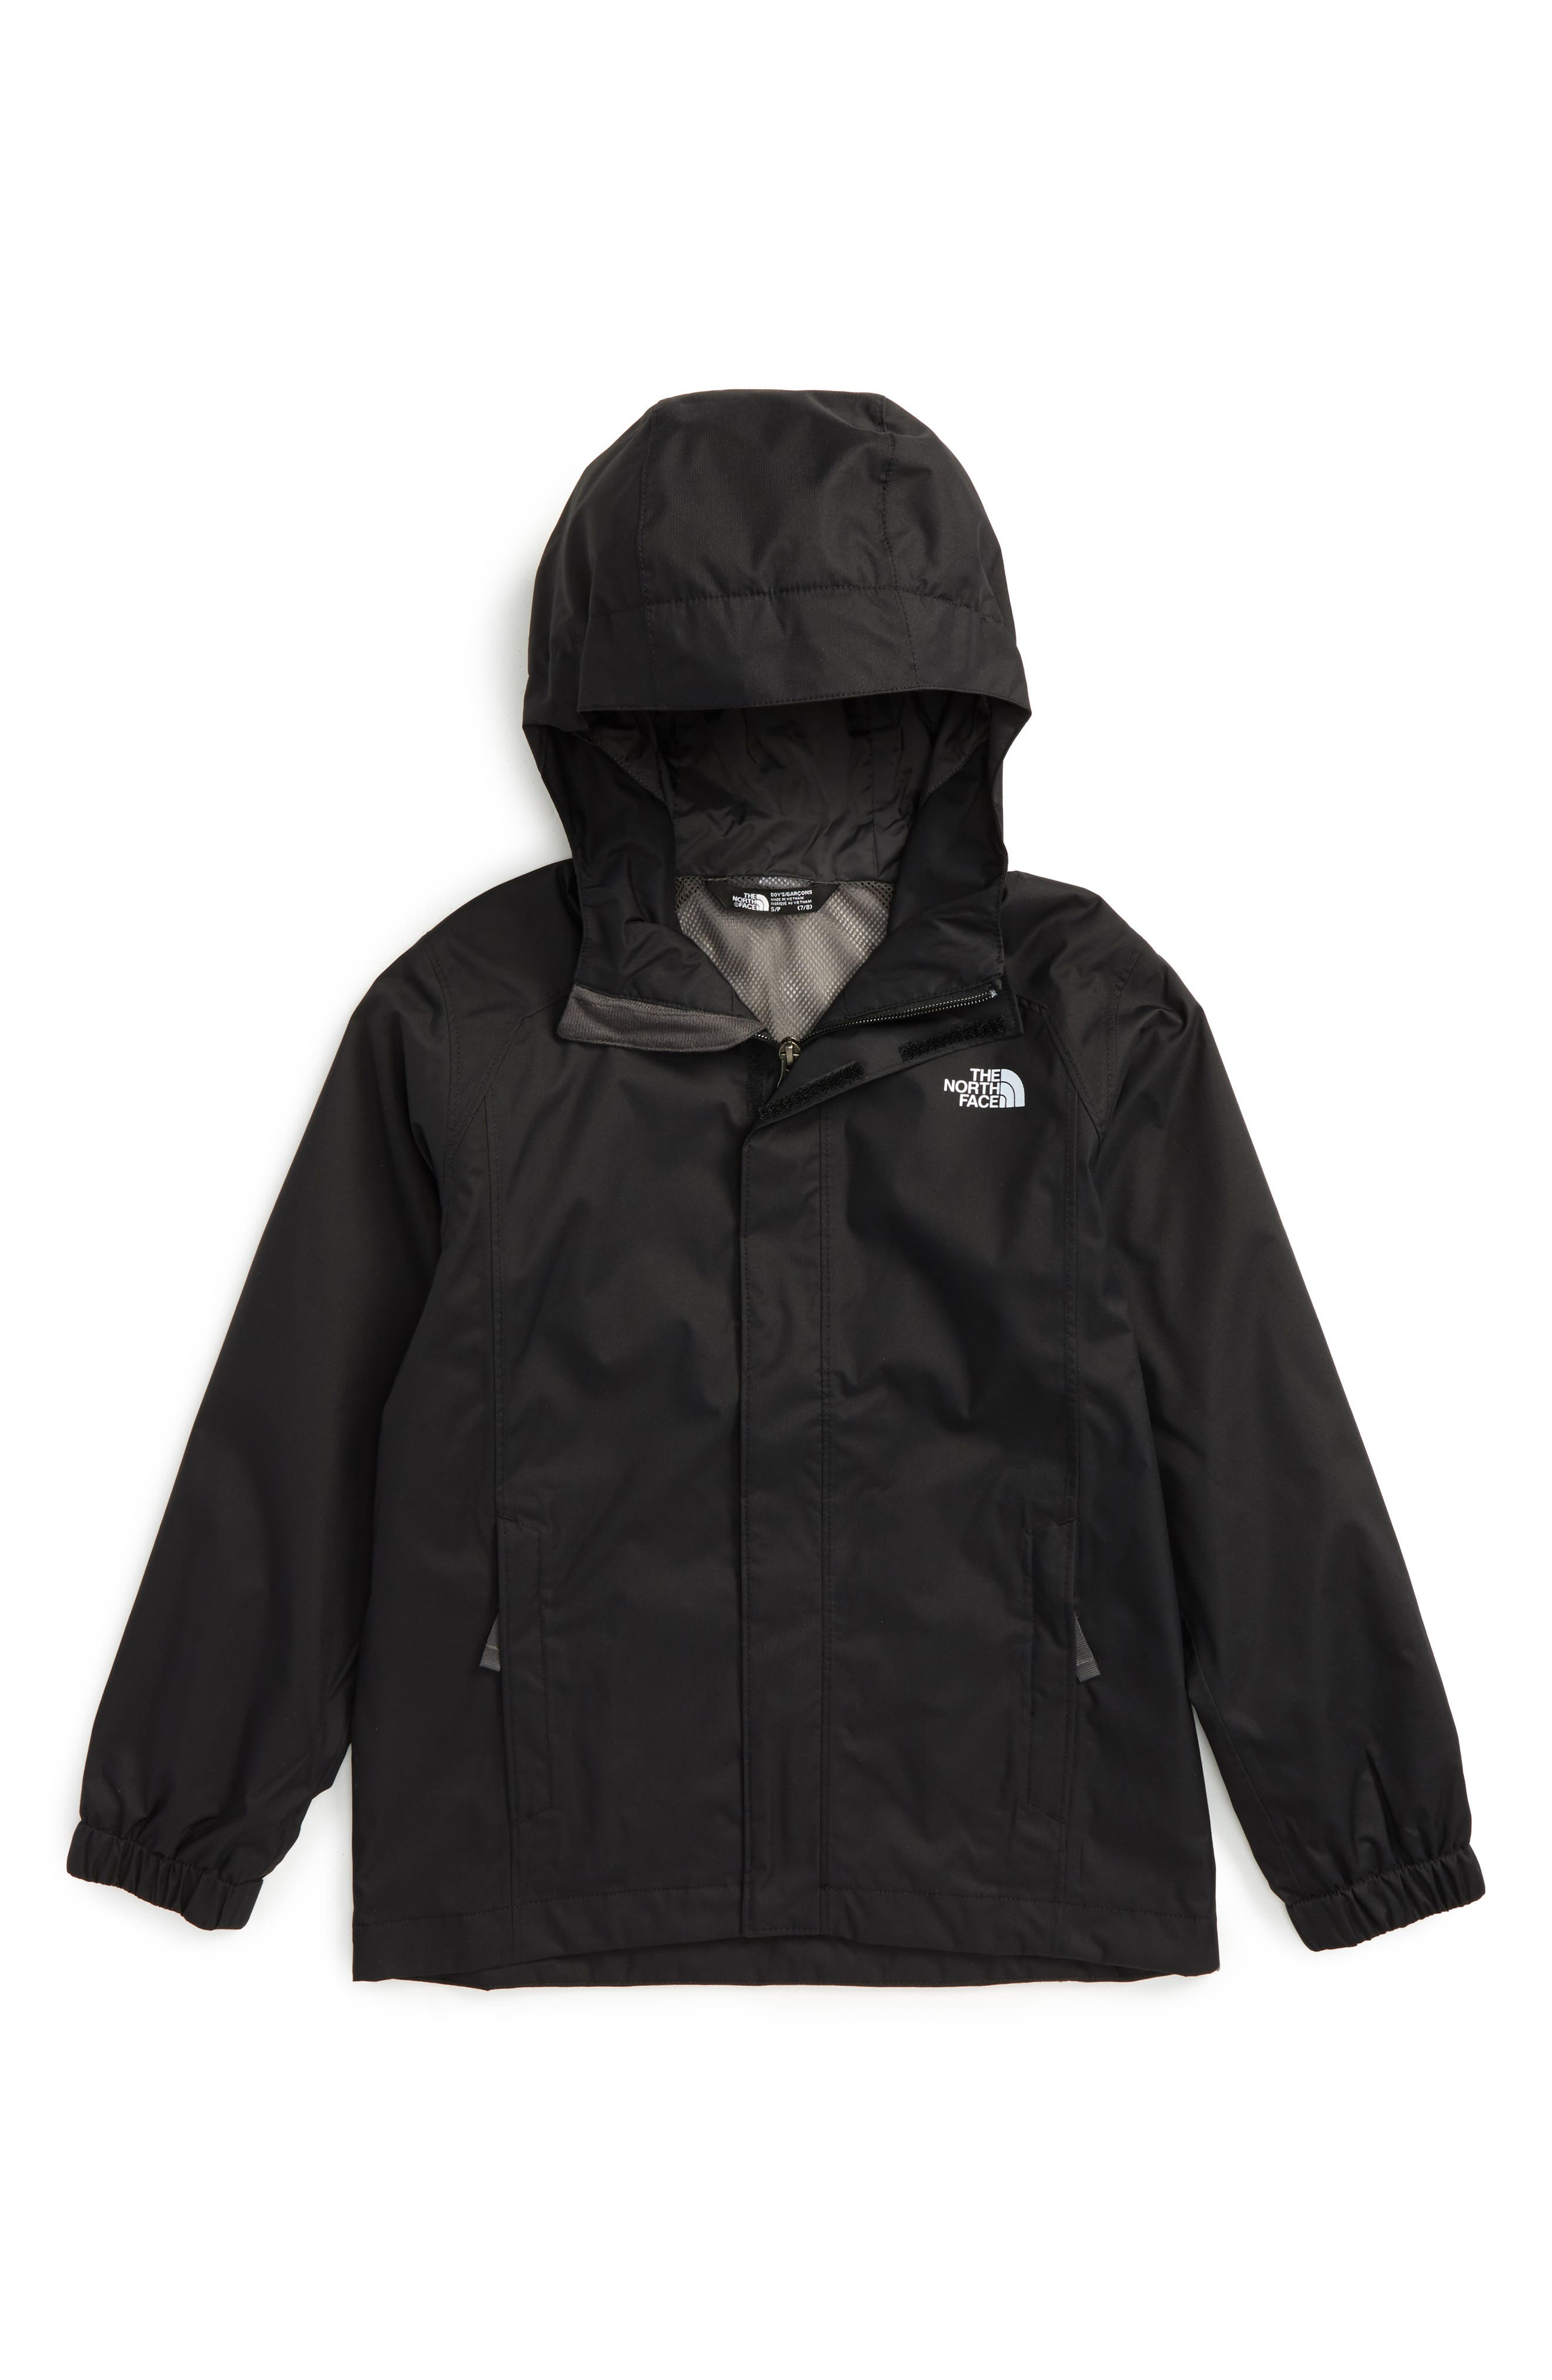 Alternate Image 1 Selected - The North Face 'Resolve' Waterproof Jacket (Big Boys)